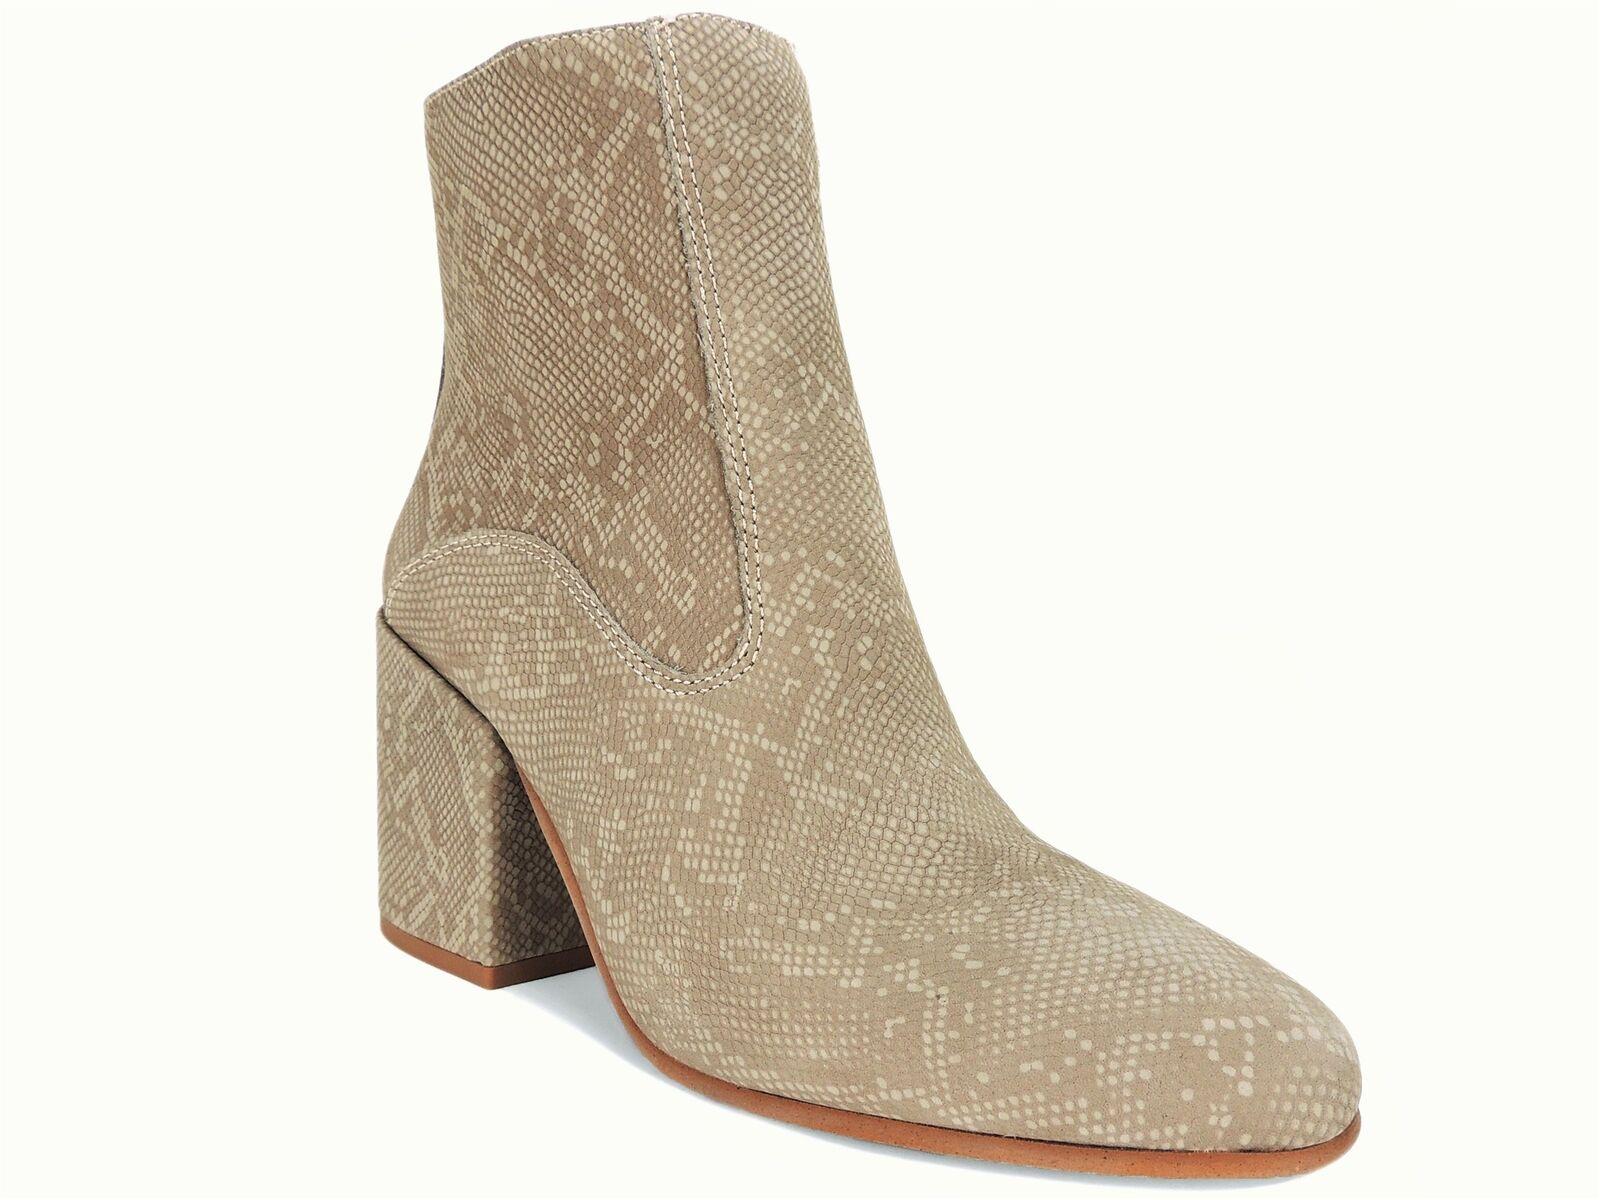 Lucky Brand Para Mujer botas botas botas rainns Pluma rimmi gris Talla 10 M  tiempo libre